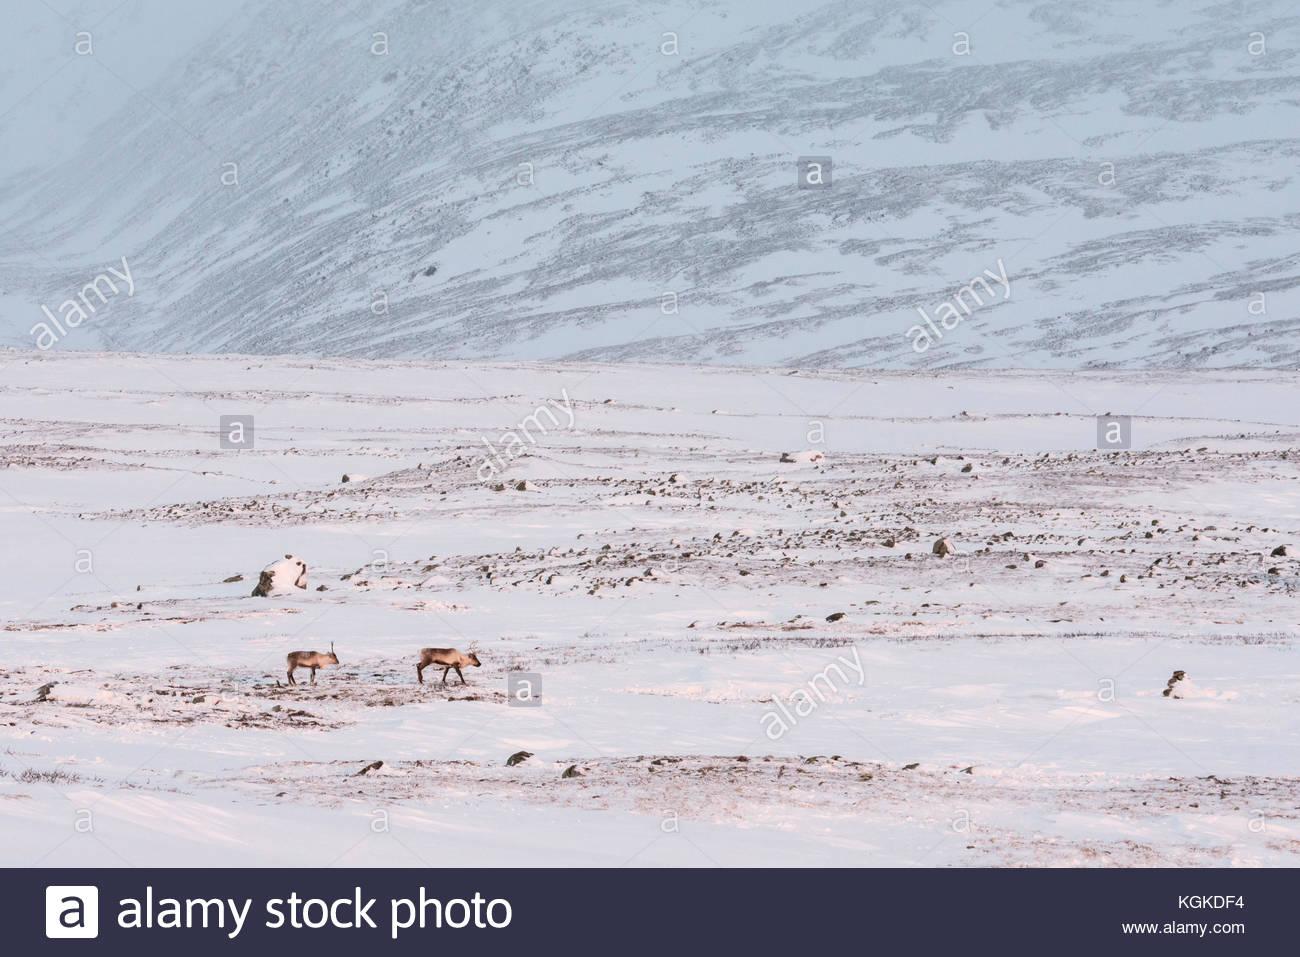 Semi-domesticated Reindeer, Rangifer tarandus, roaming free in snow-covered mountain landscape. - Stock Image